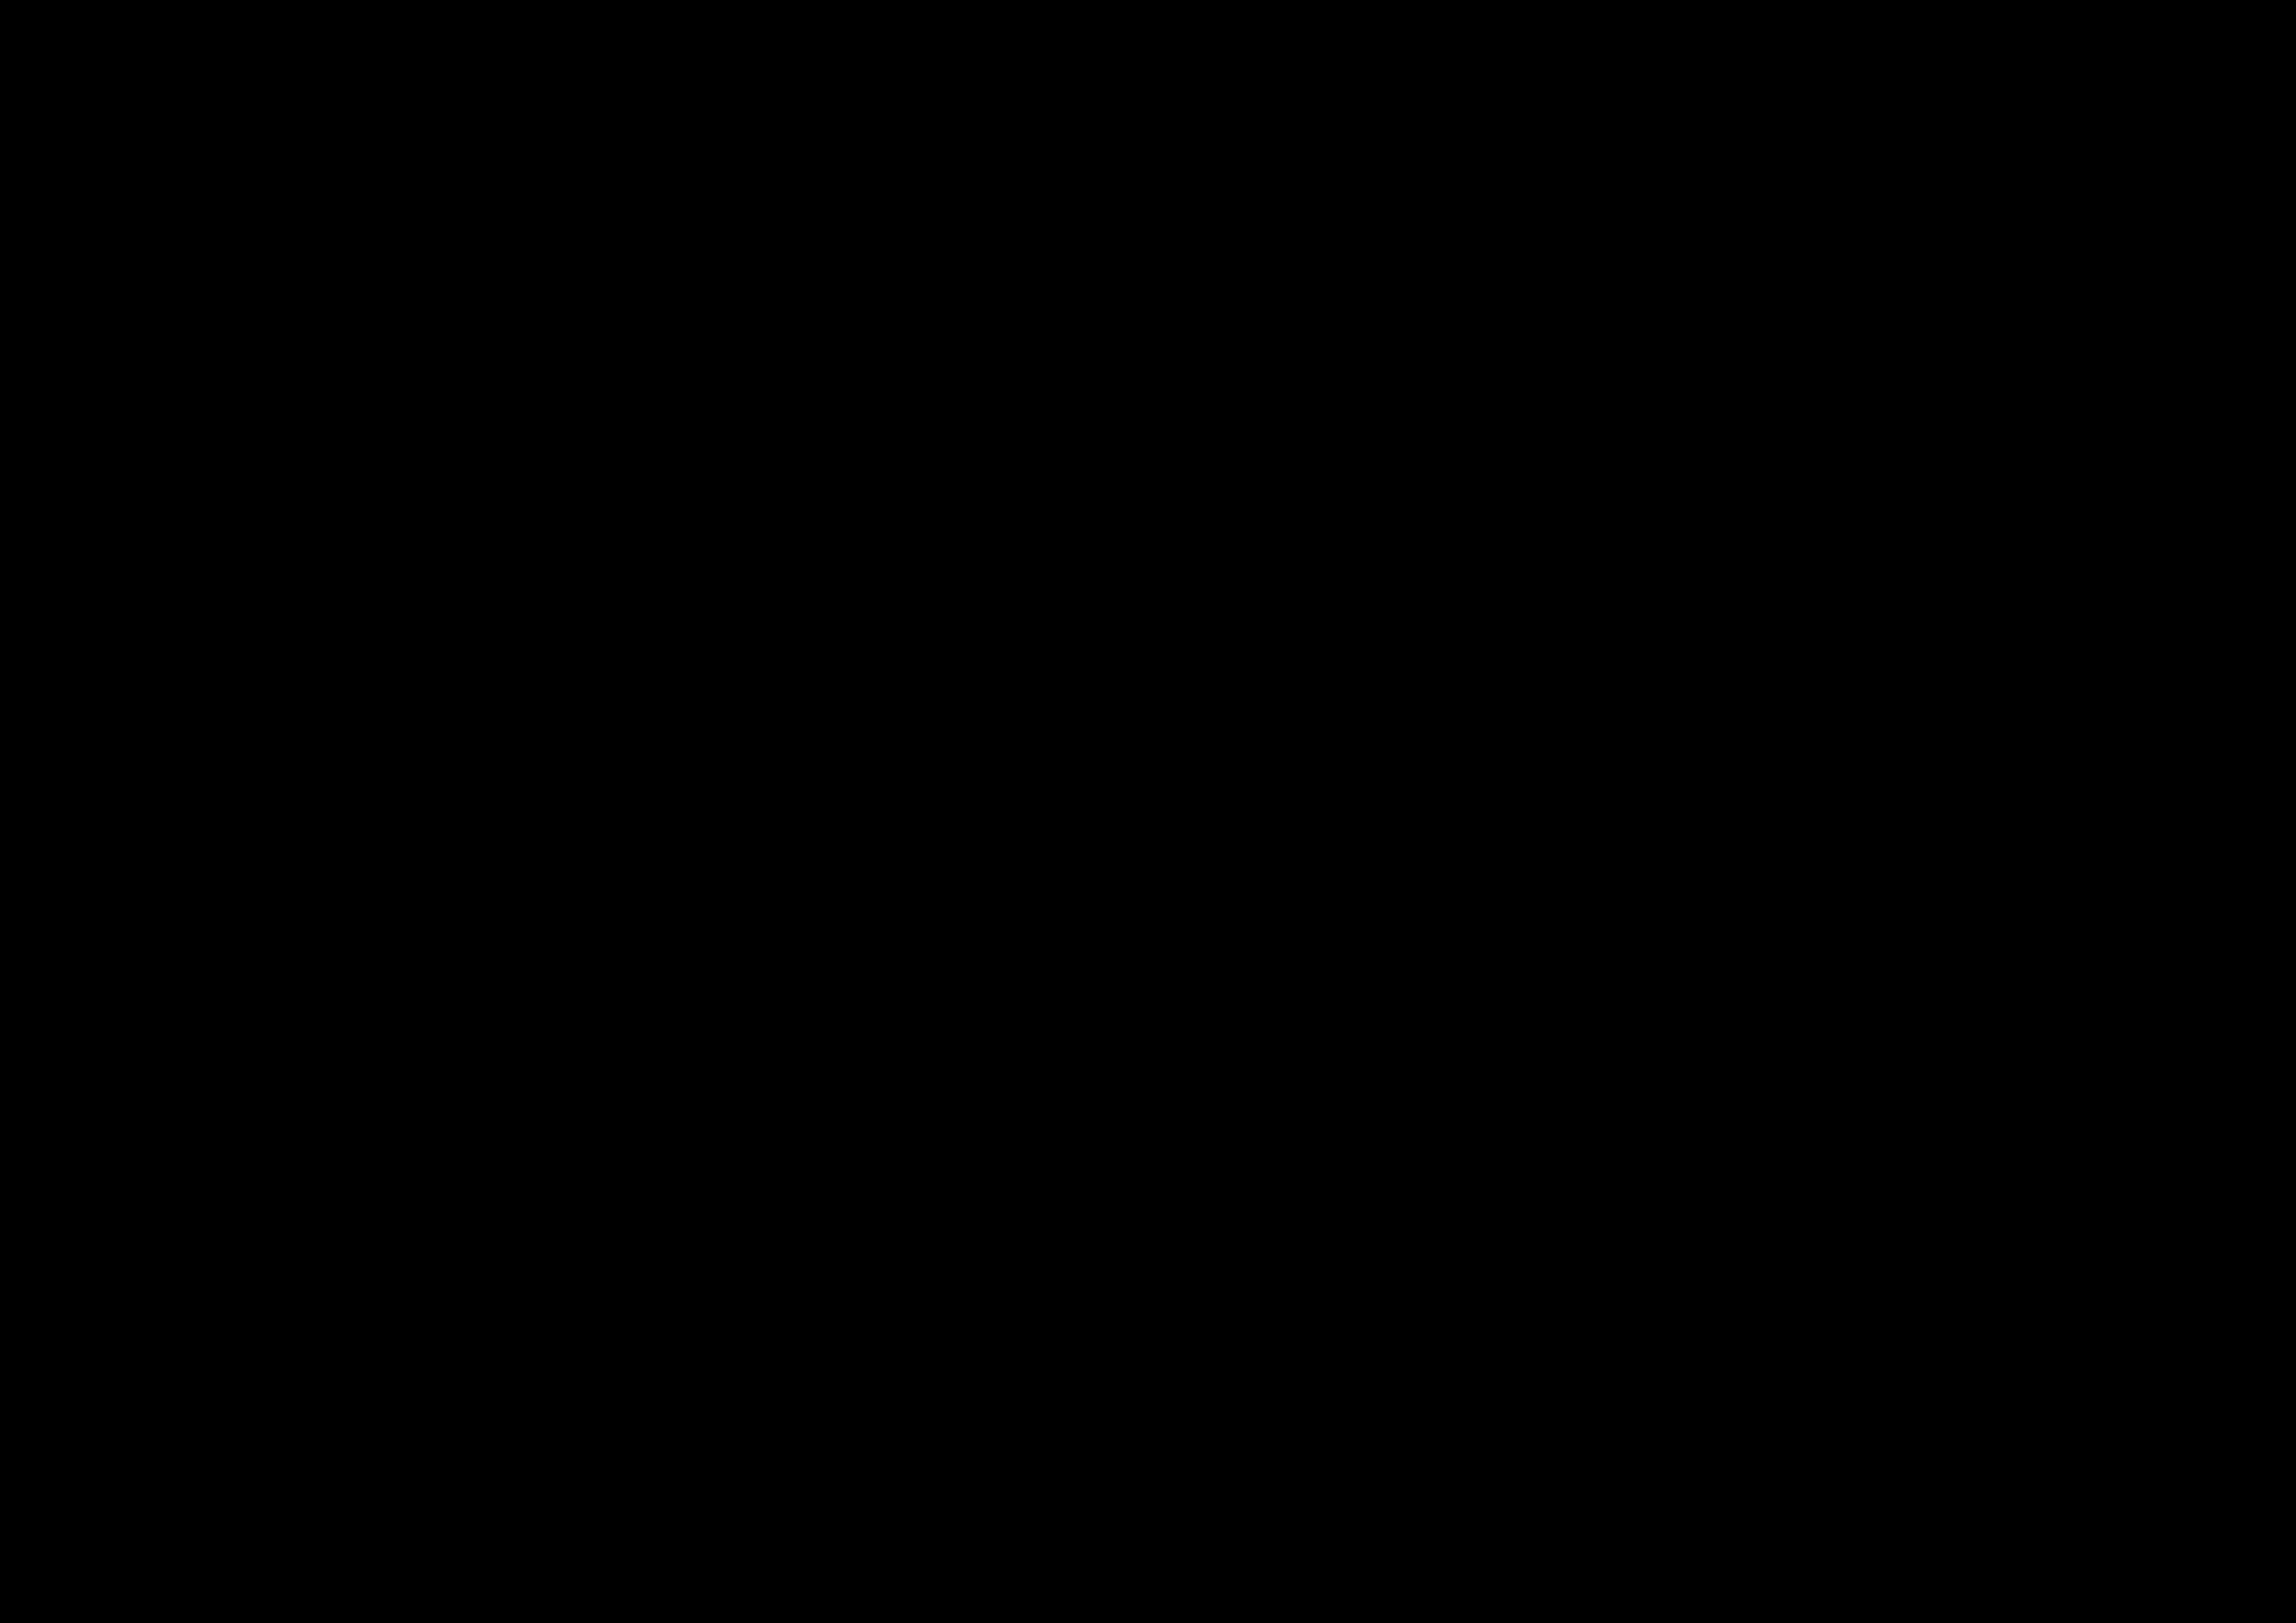 WoodvaleParkVH_Logo-04.png